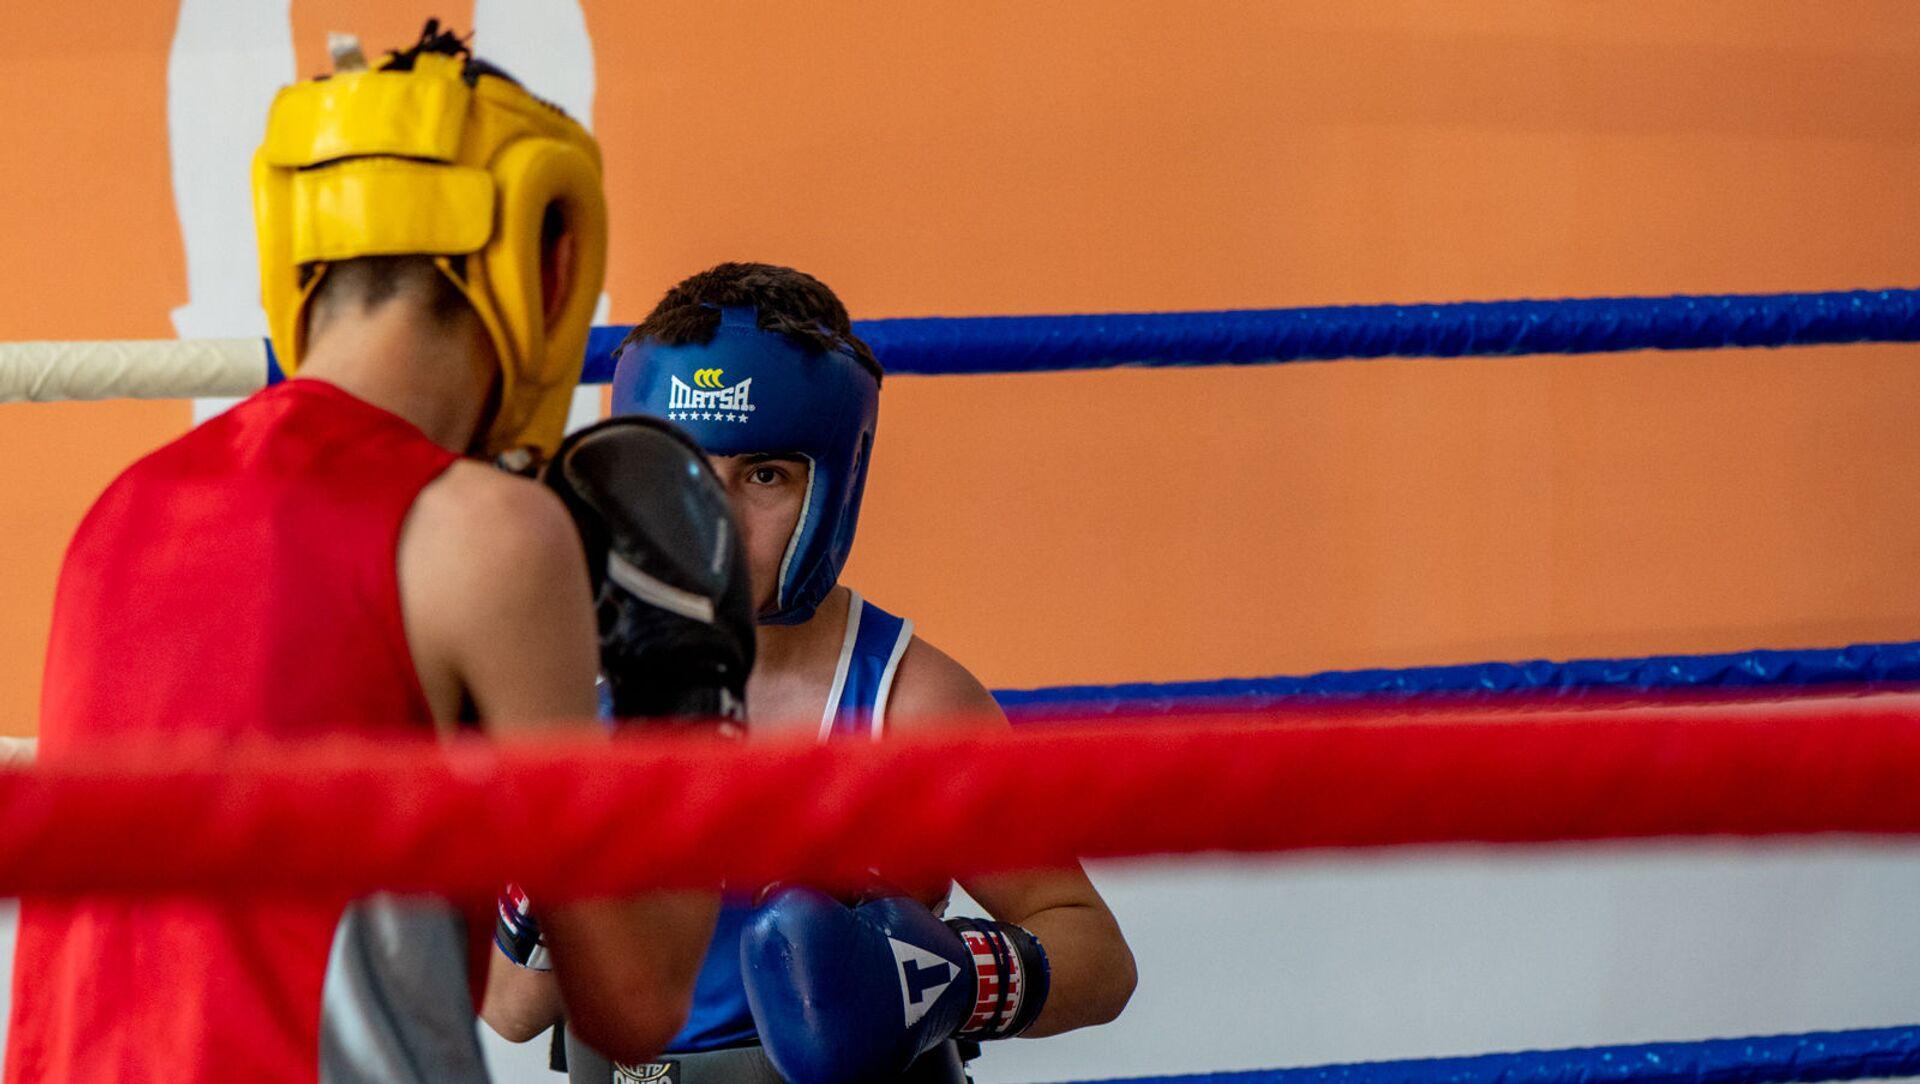 Школа бокса 12 rounds - Sputnik Армения, 1920, 22.06.2021